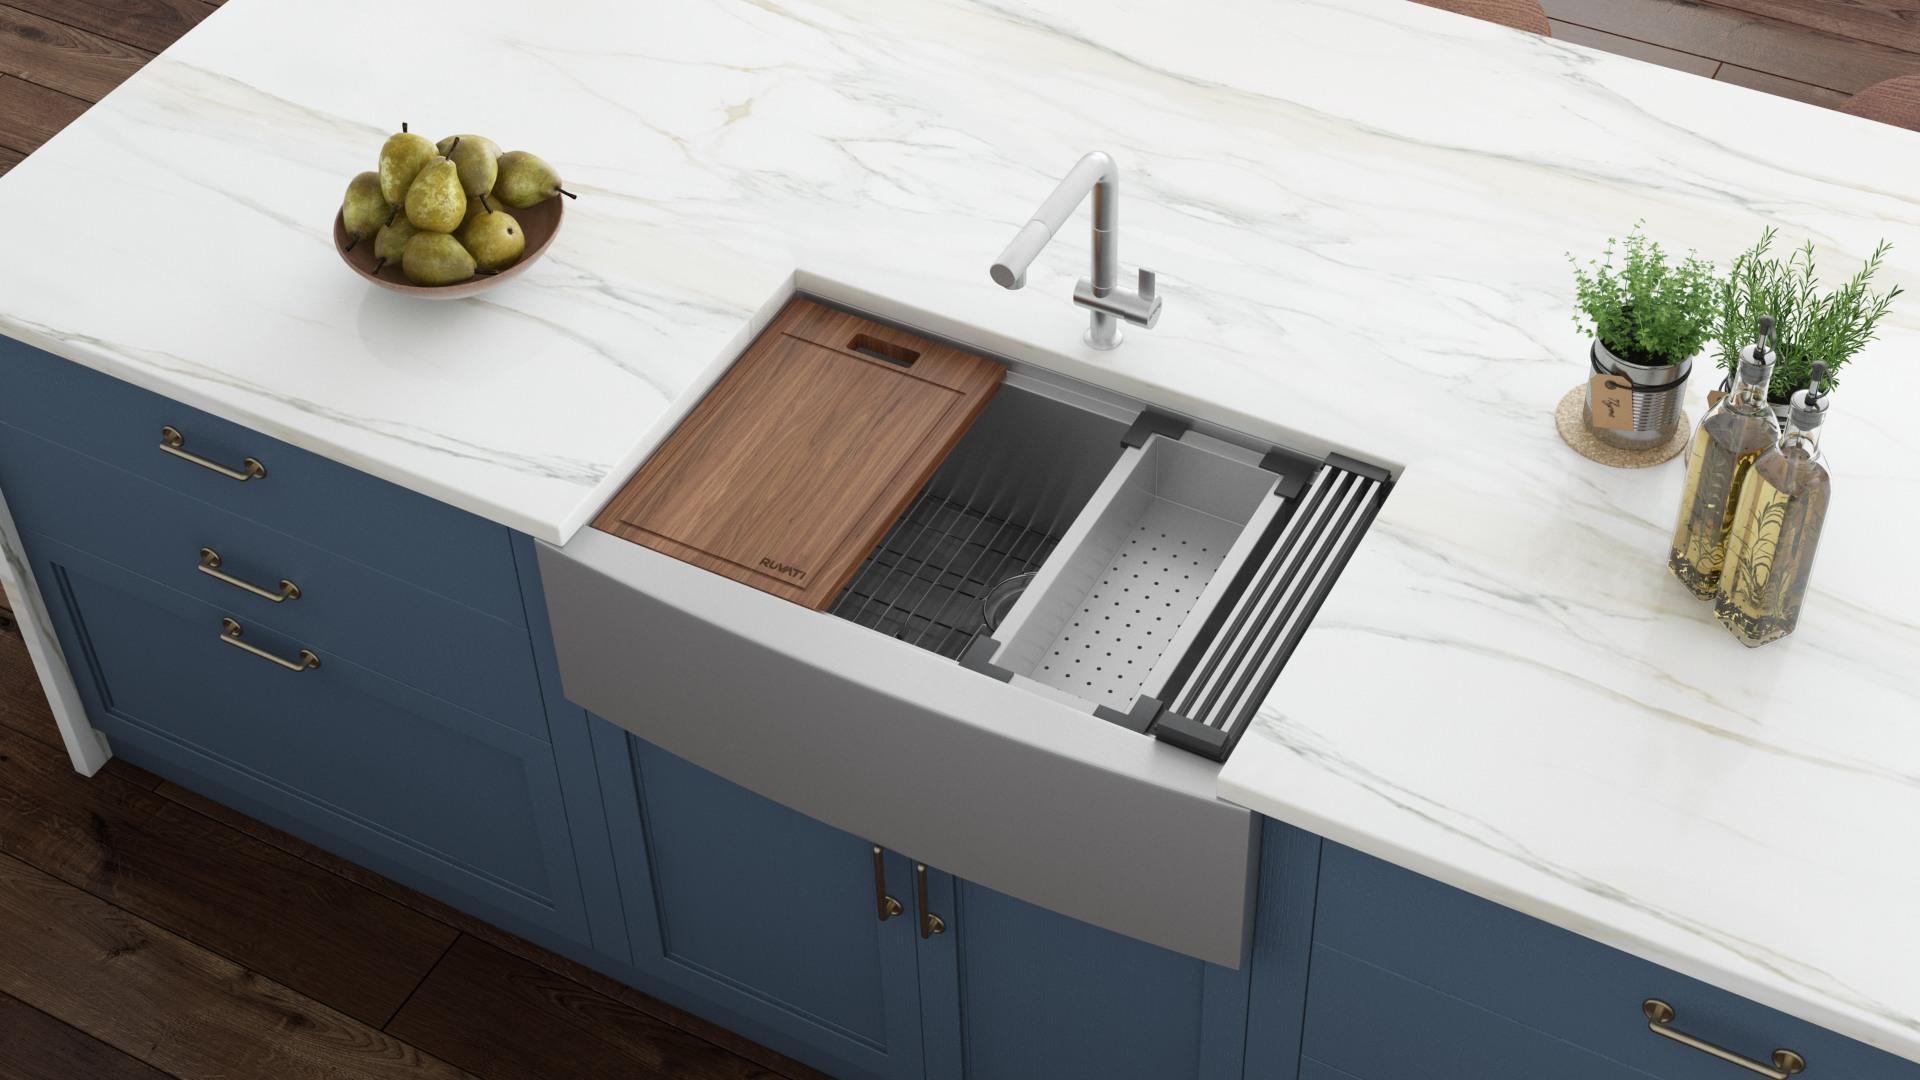 ruvati verona farmhouse apron front 36 in x 22 in stainless steel single bowl workstation kitchen sink